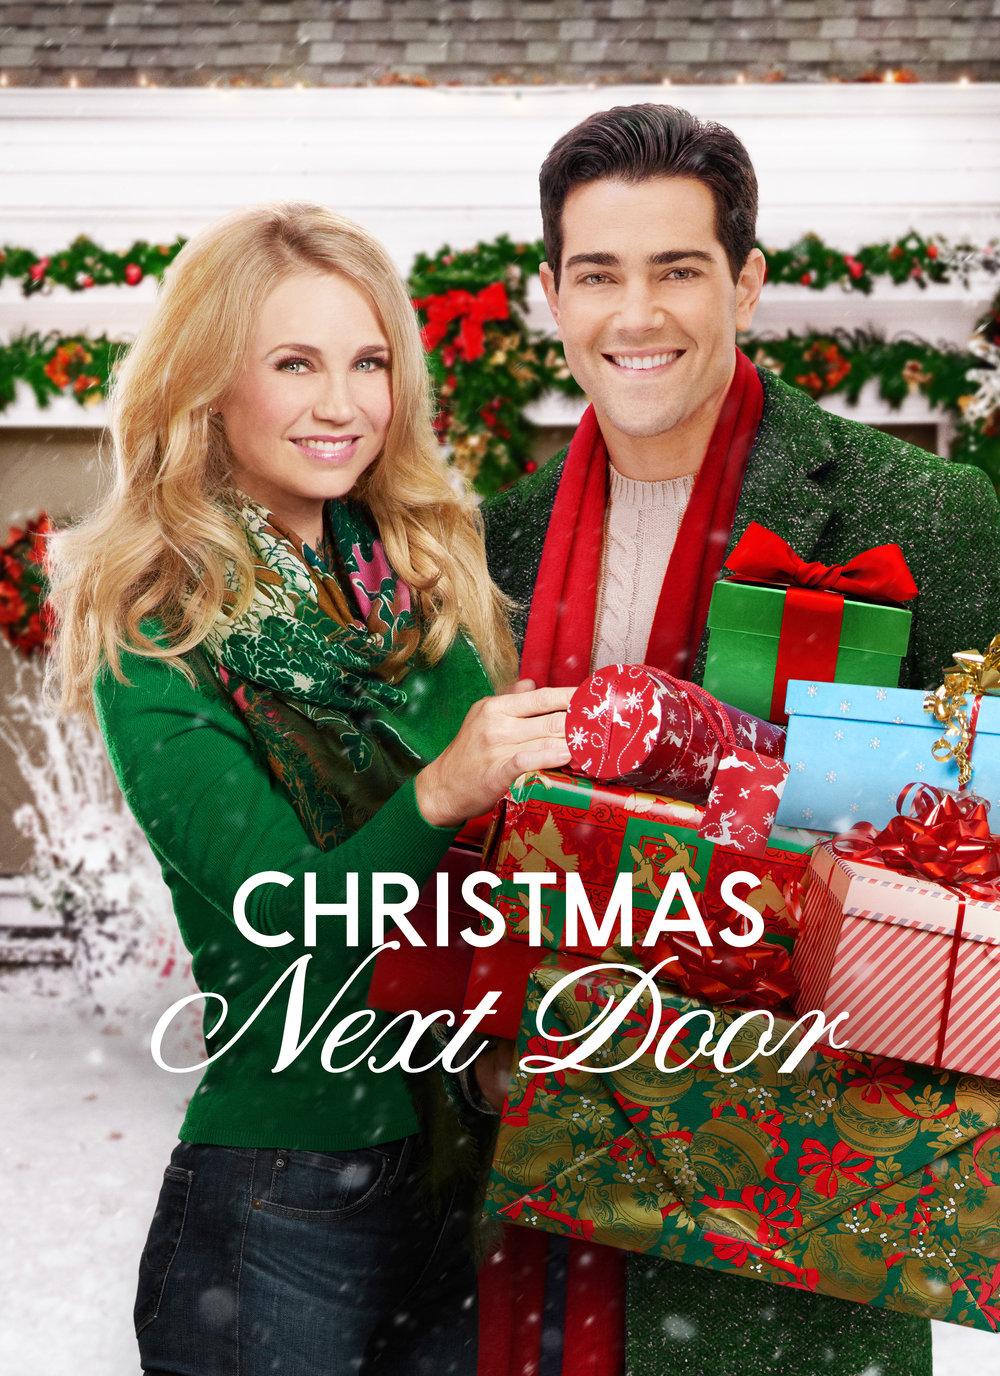 ChristmasNextDoor_FKA.jpg